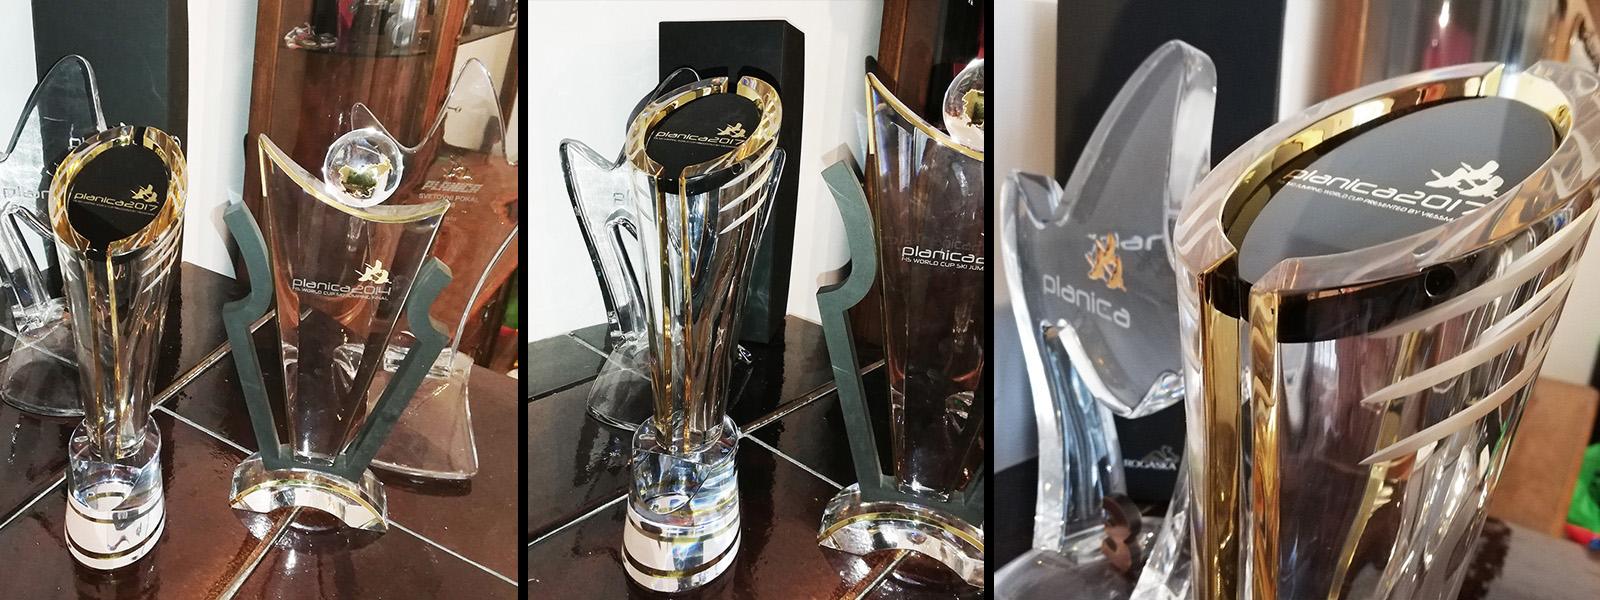 Planica pokal trophy comp 2